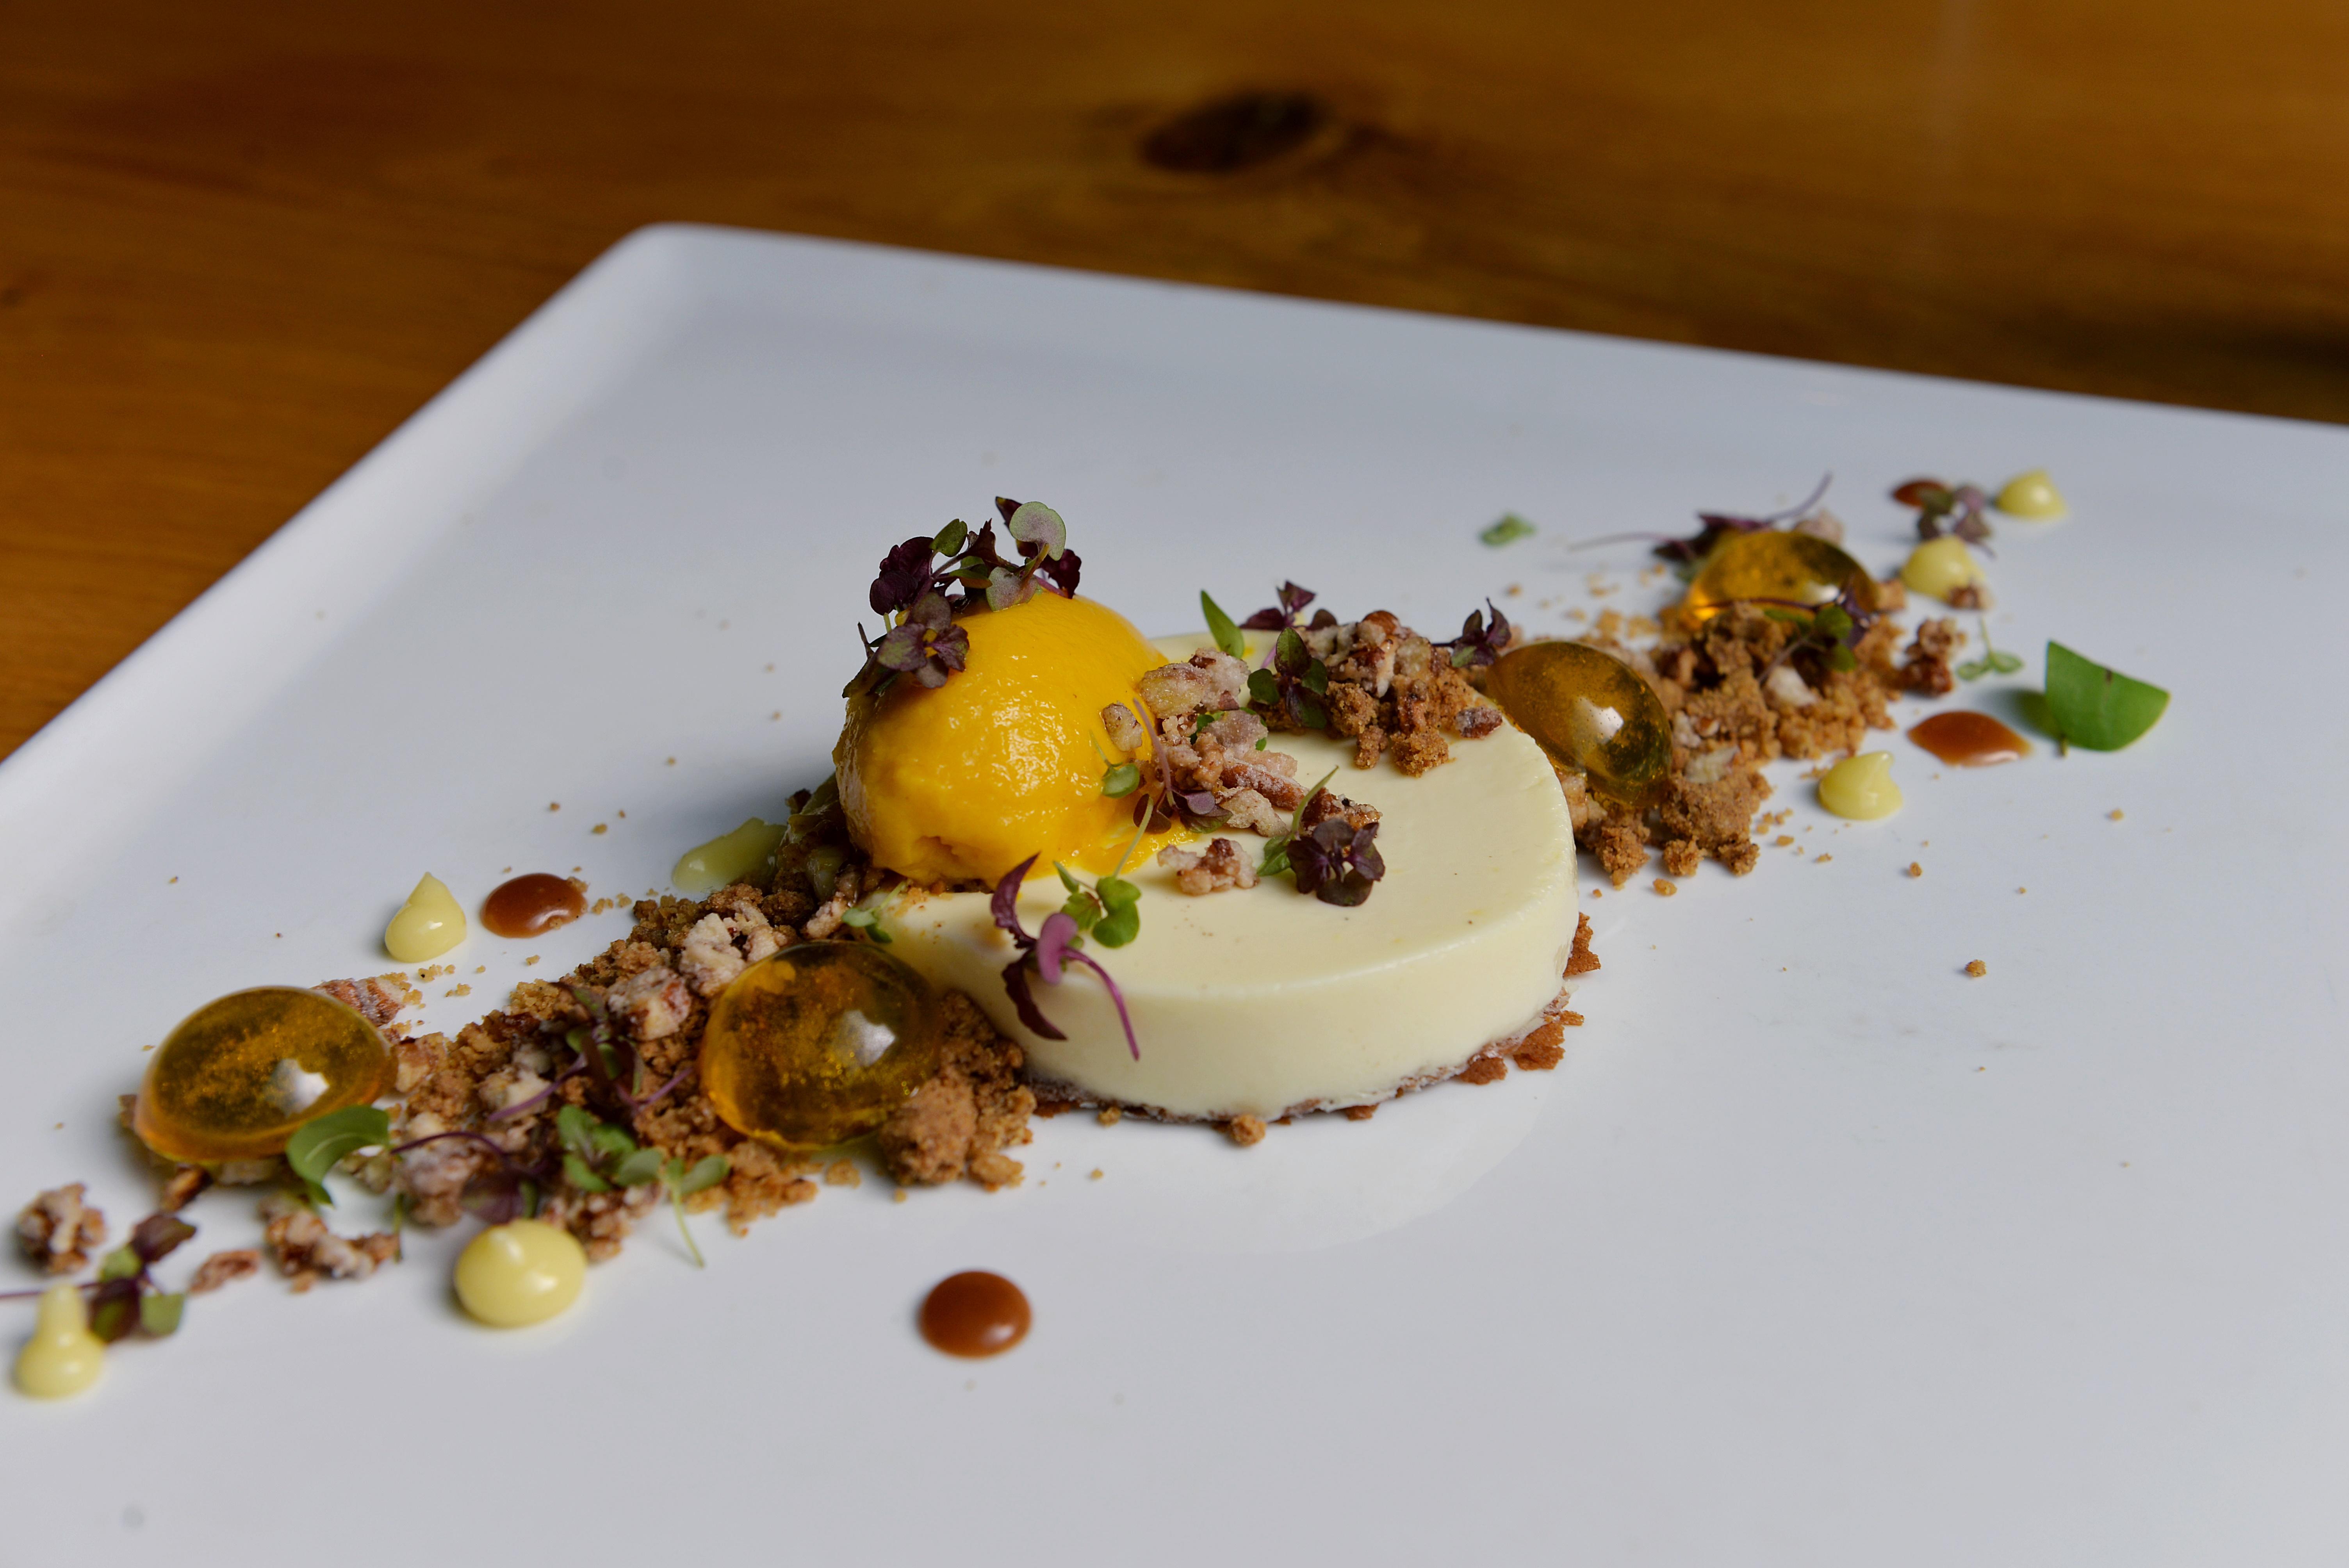 Fall Dessert at Kuu